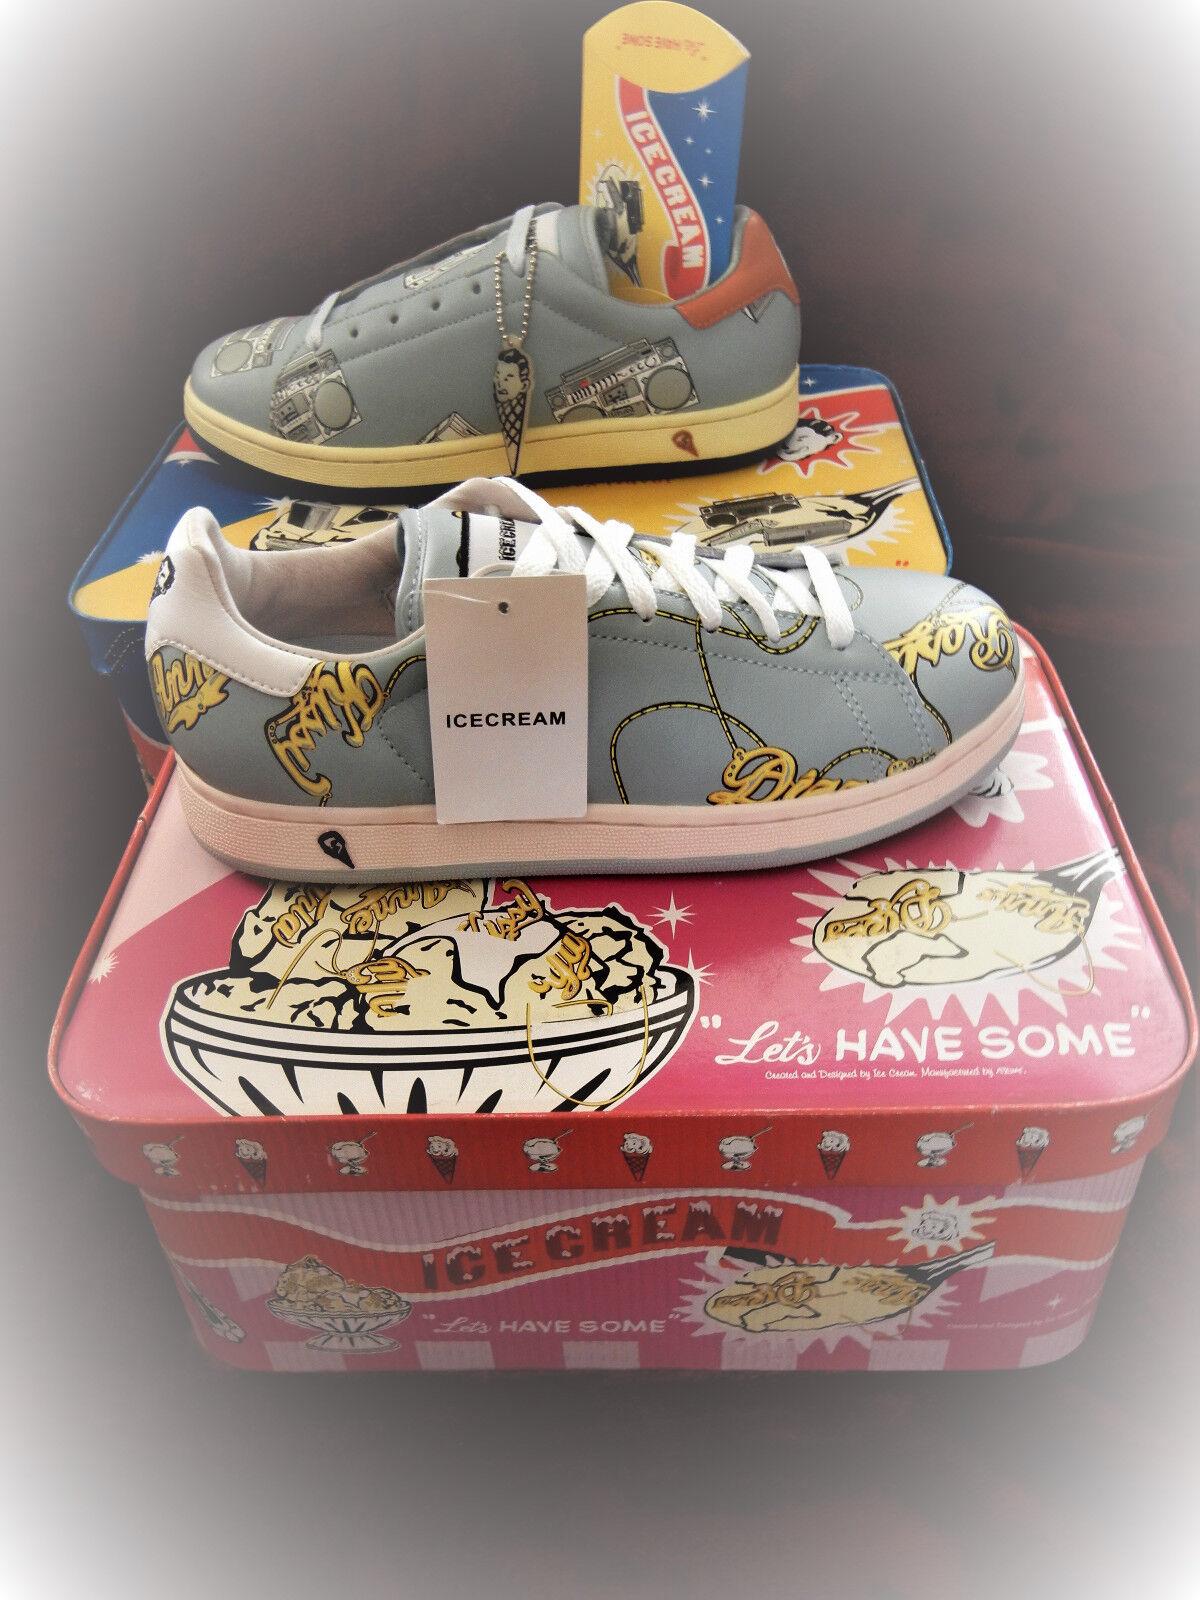 Reebok Ice Cream  Boutiques Petites  NameChain shoes SIZE 6  Pharrell ICECREAM